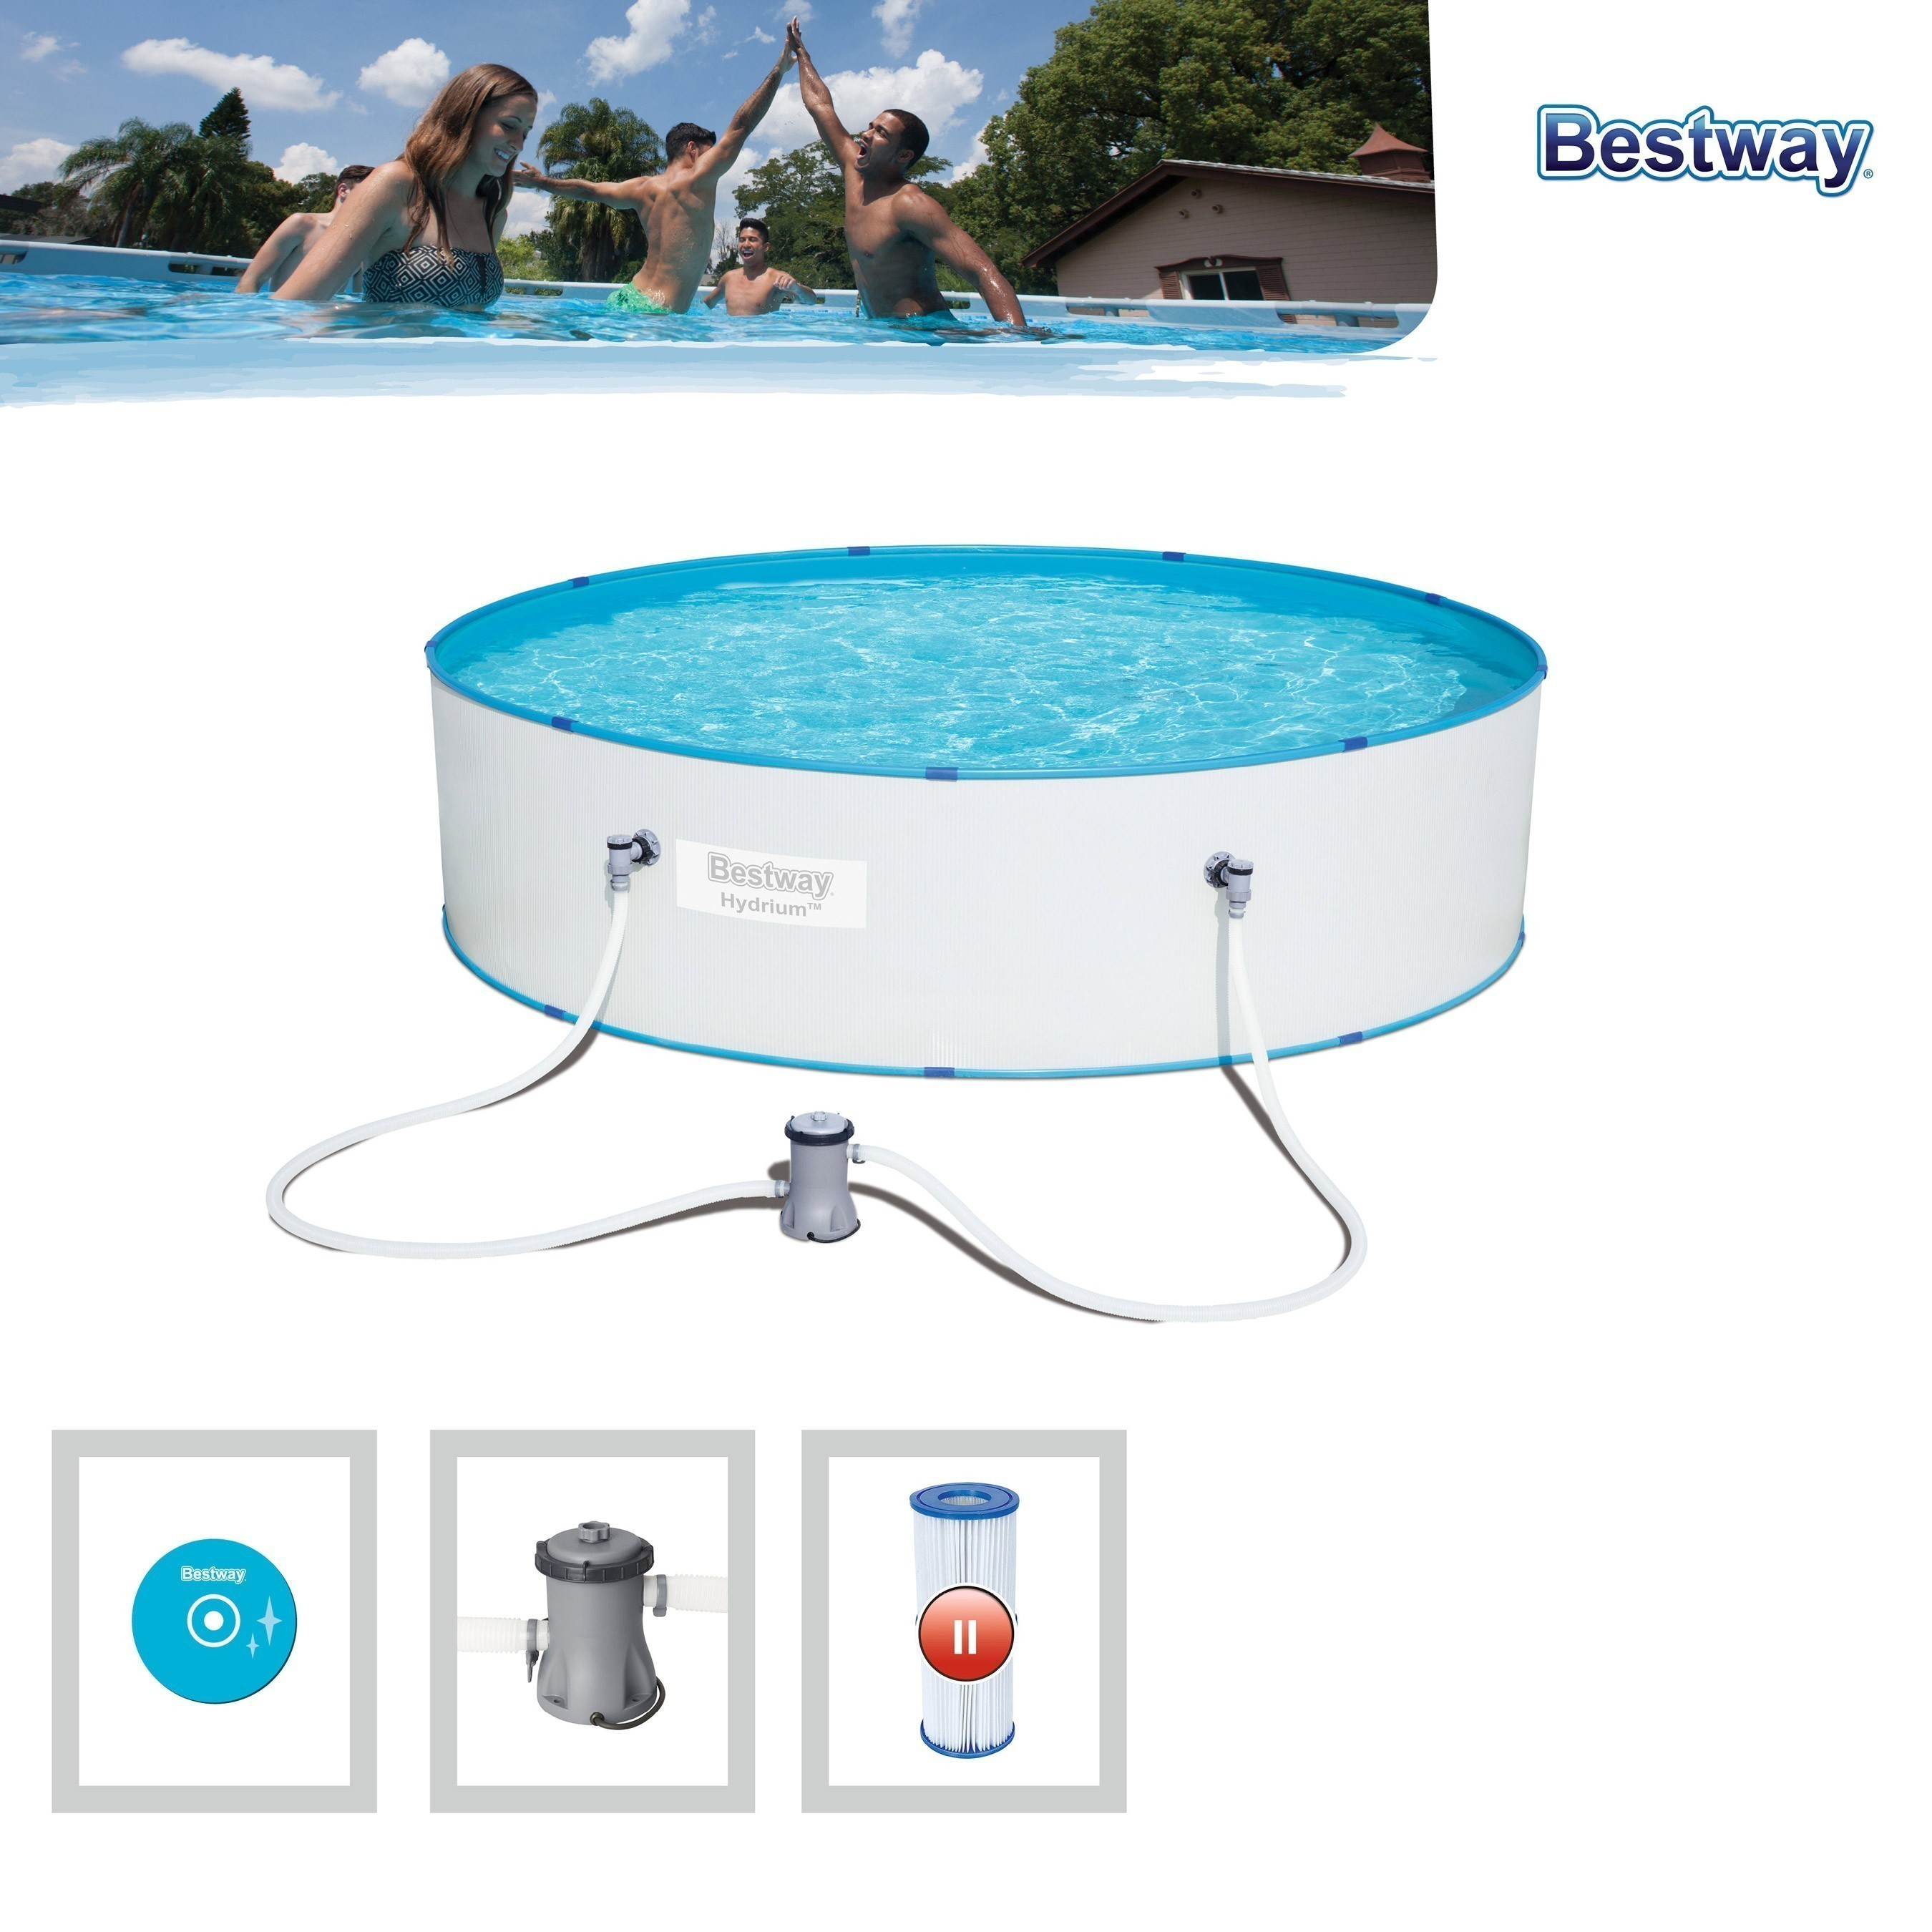 Pool / Stahlwandpool Bestway Hydrium Splasher Set Filterpumpe Ø330x84 Bild 2